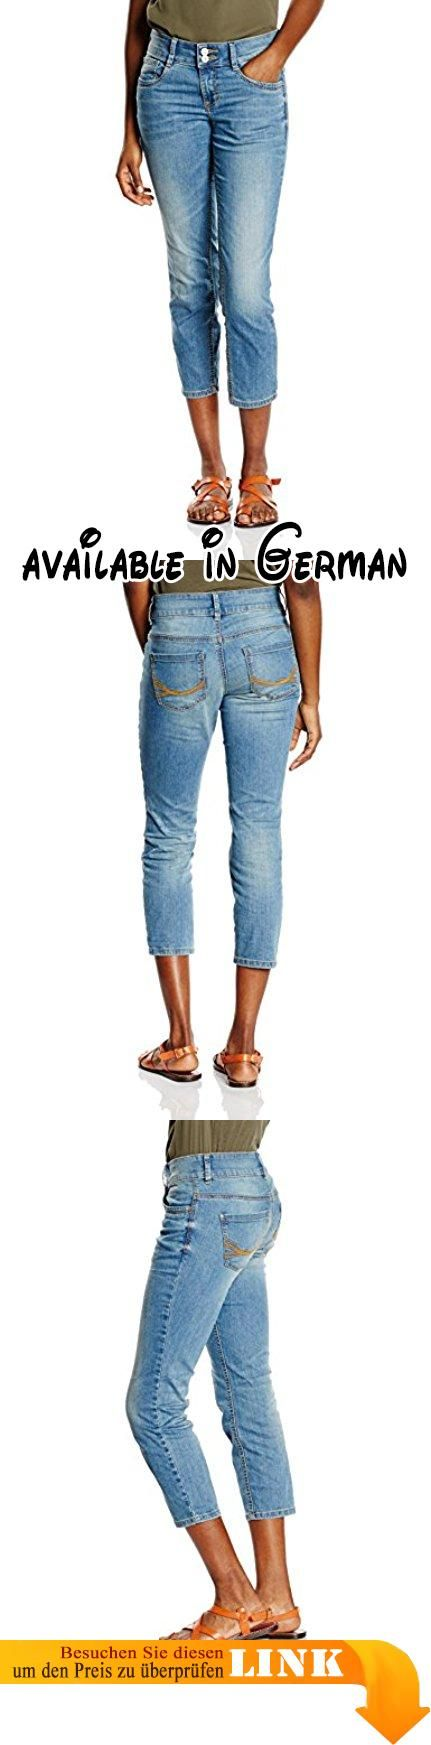 TOM TAILOR Damen 7/8 Jeanshose Jeans Alexa Slim/603, Gr. W32/L32, Blau (stone wash denim 1054). TOM TAILOR Damen Jeanshose #Apparel #PANTS